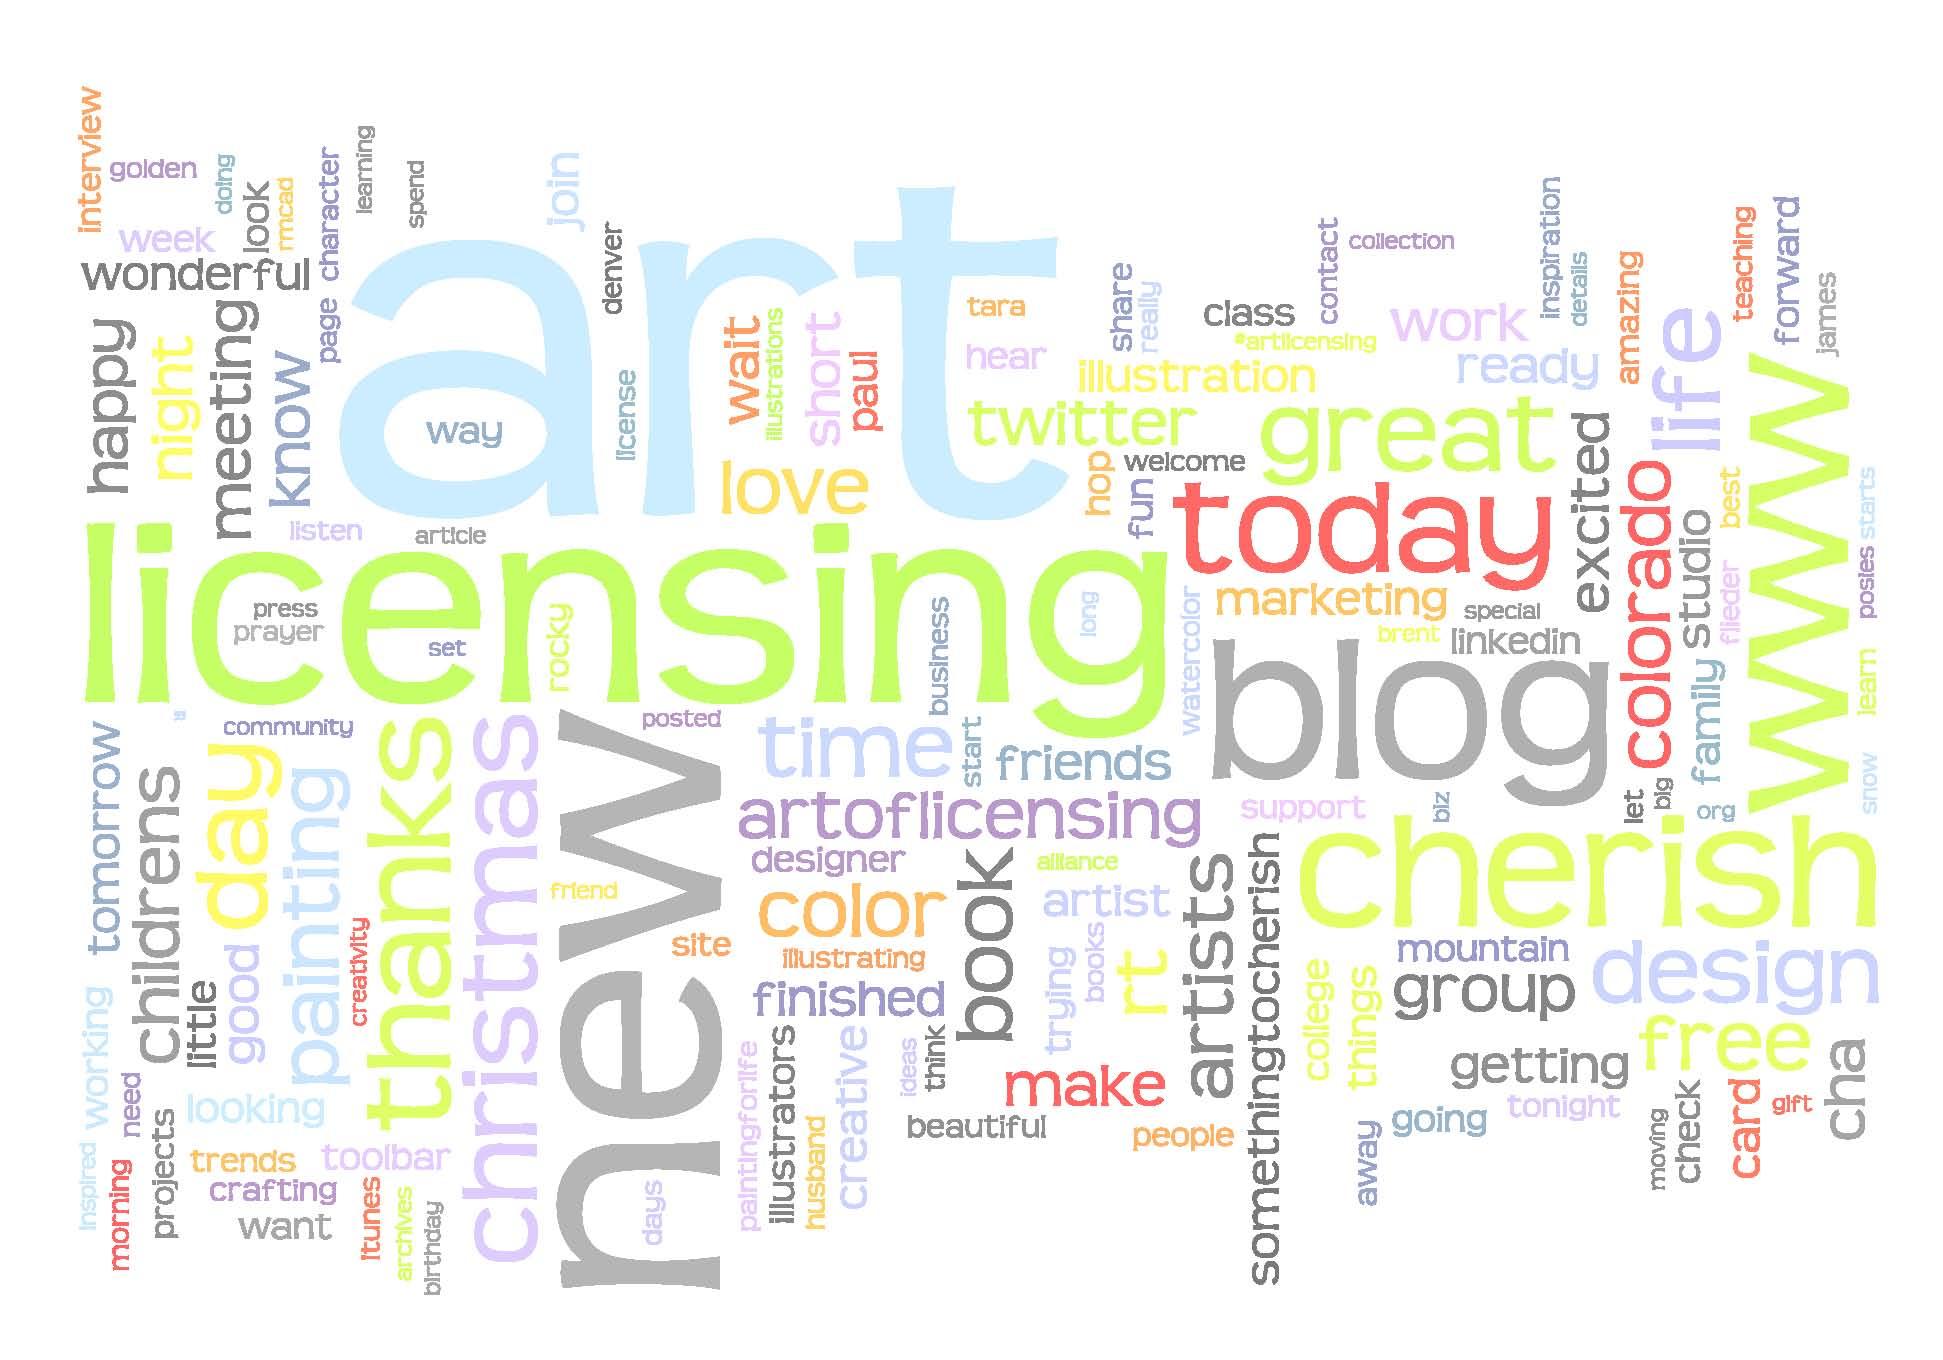 Twitter Wordle for @cherishart